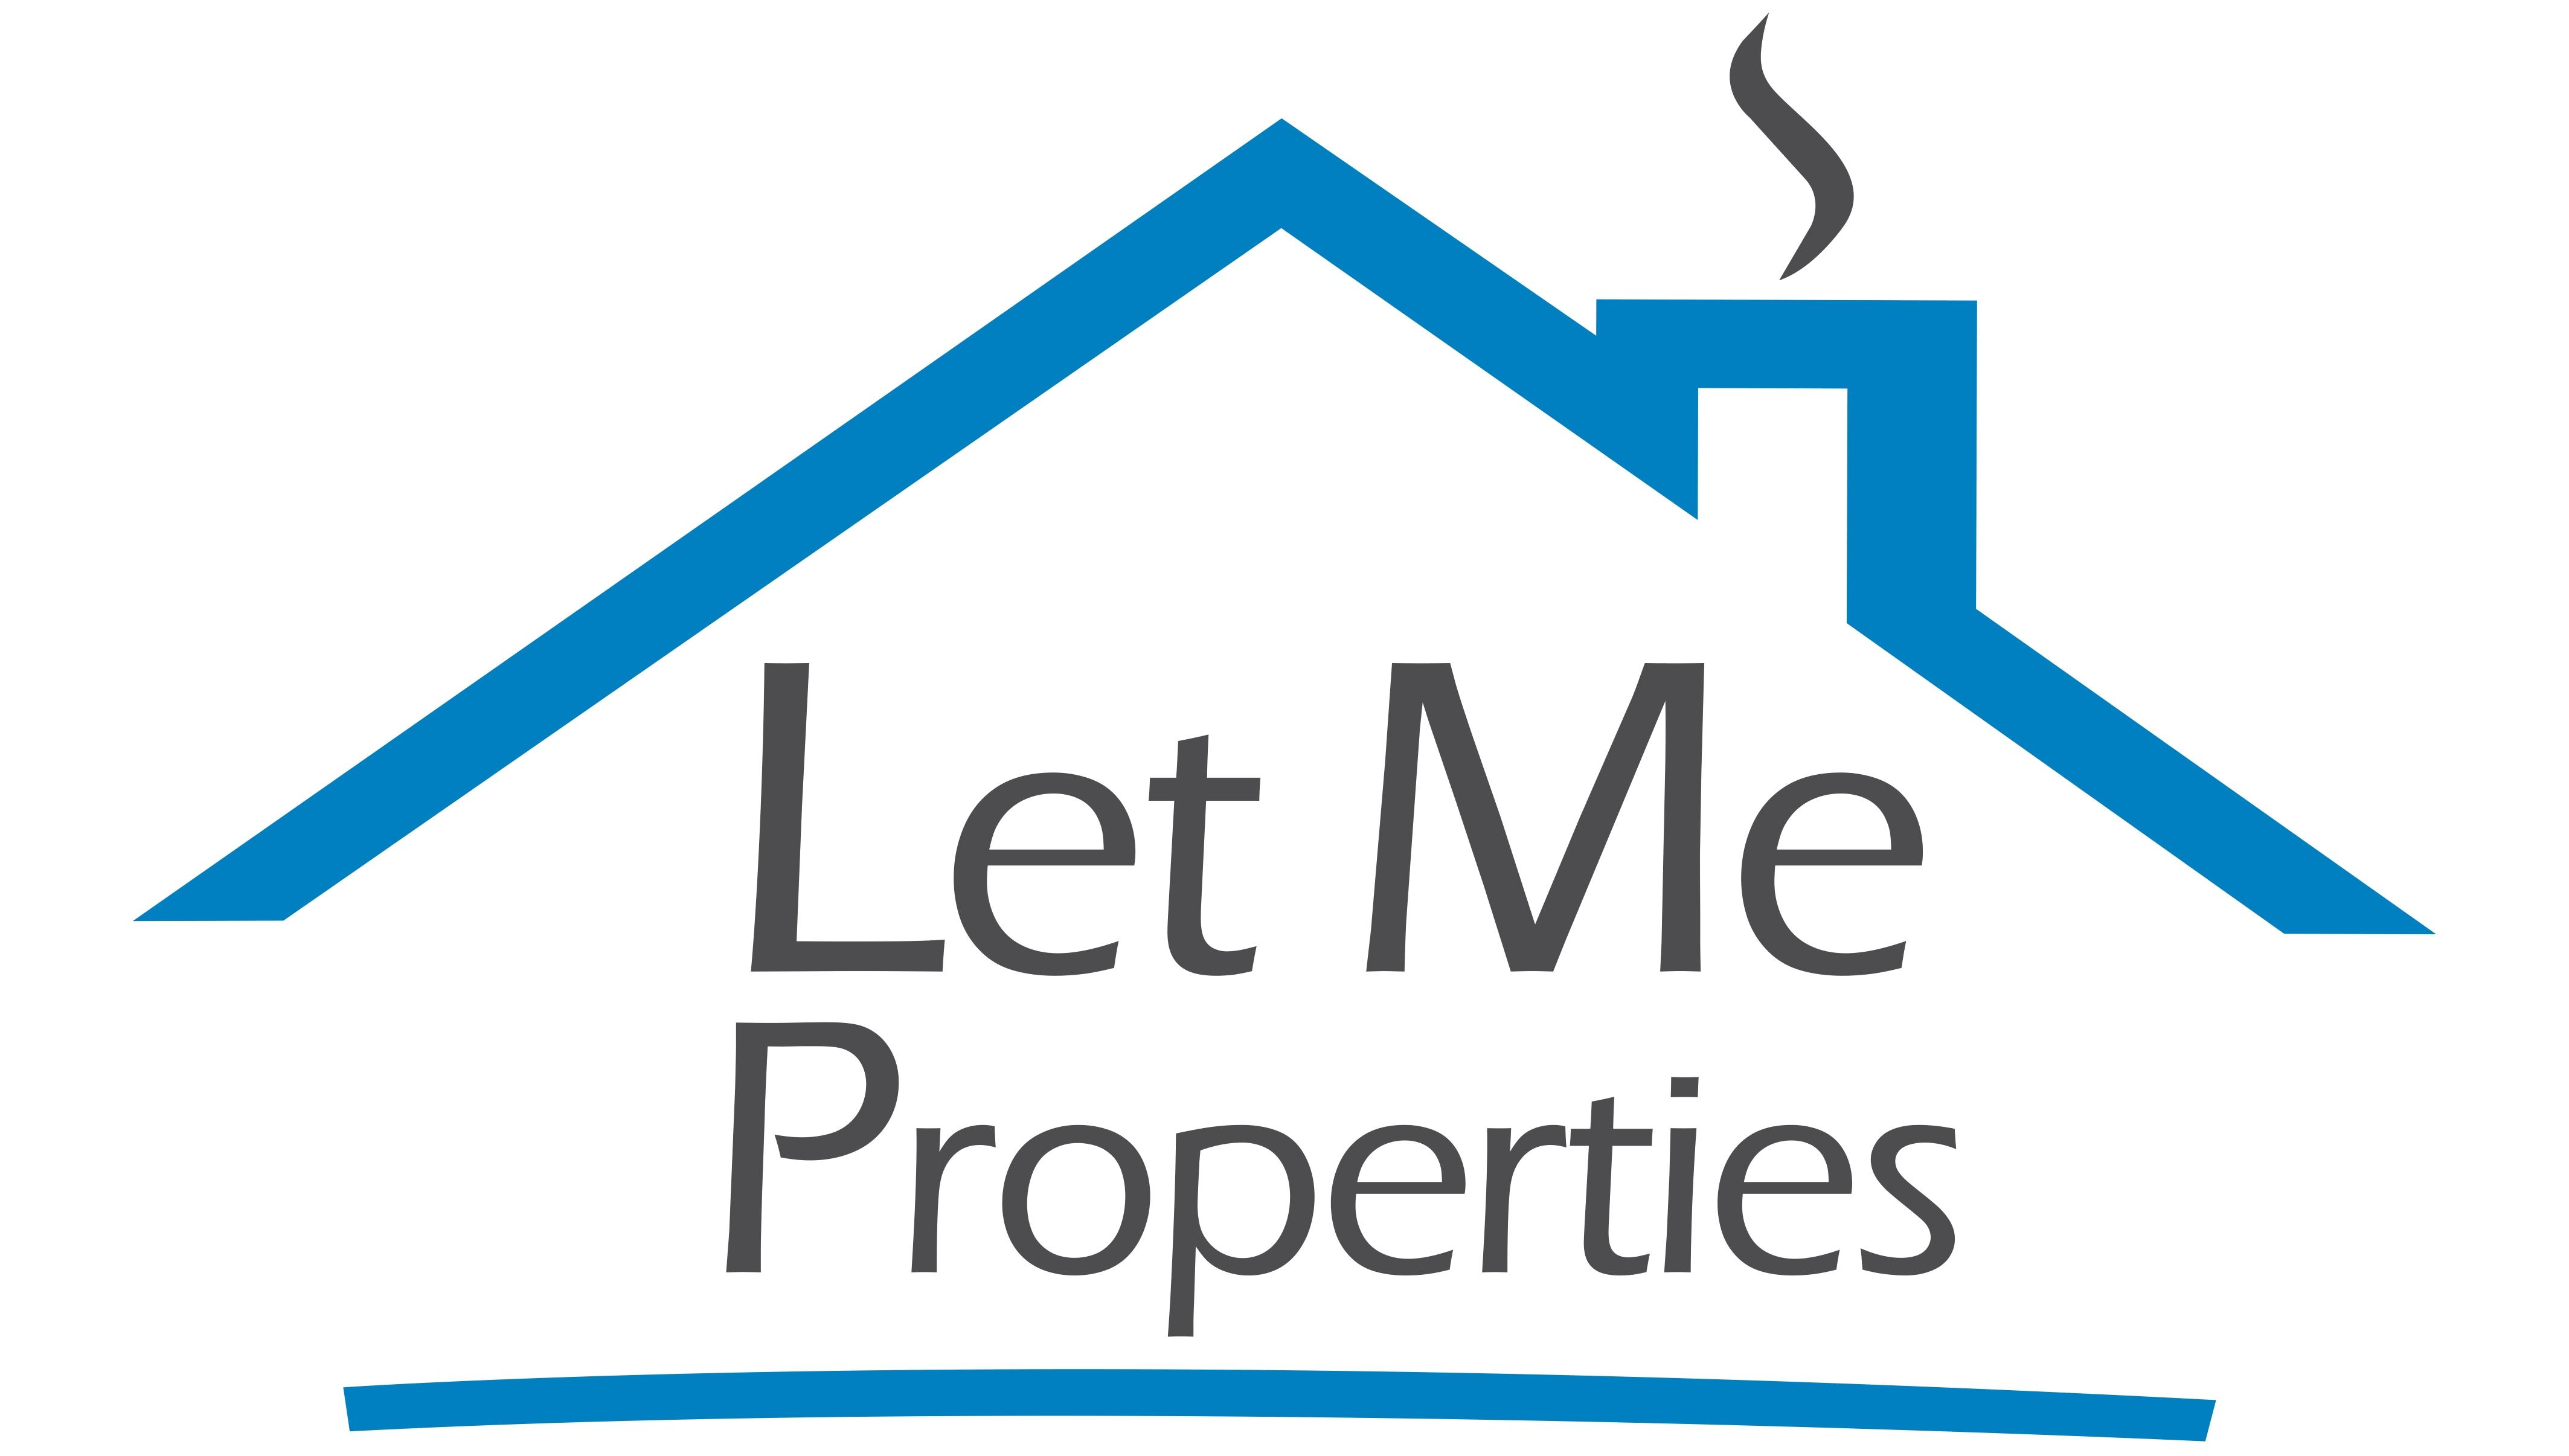 logo for Let Me Properties